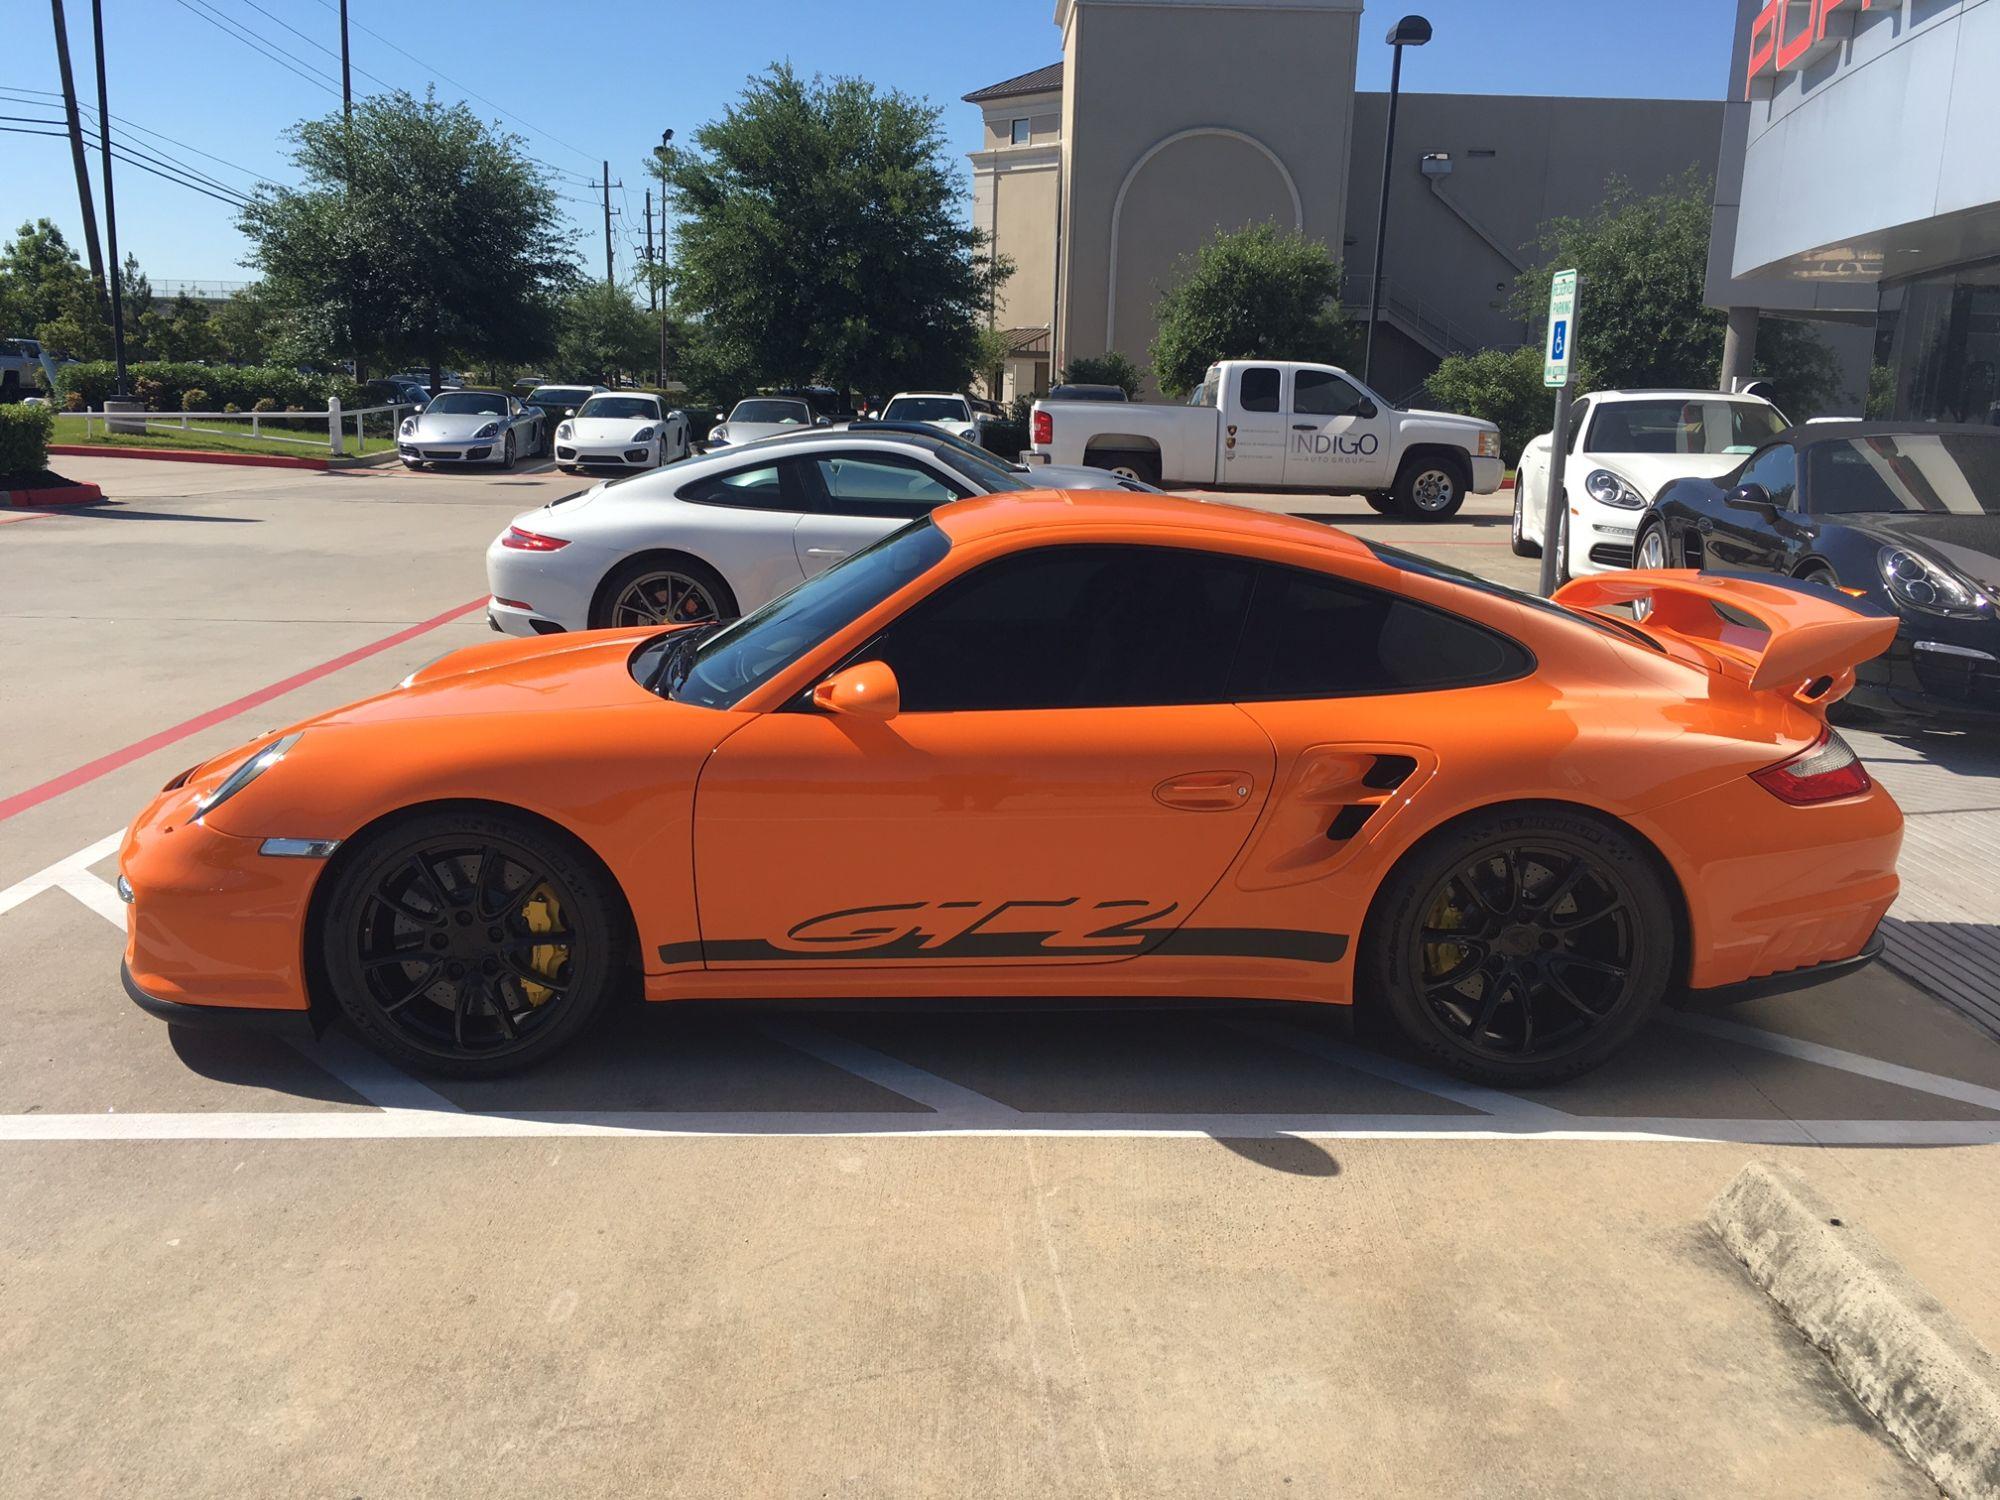 2009 porsche 911 gt2 in pts orange for sale at 410 000 autoevolution. Black Bedroom Furniture Sets. Home Design Ideas